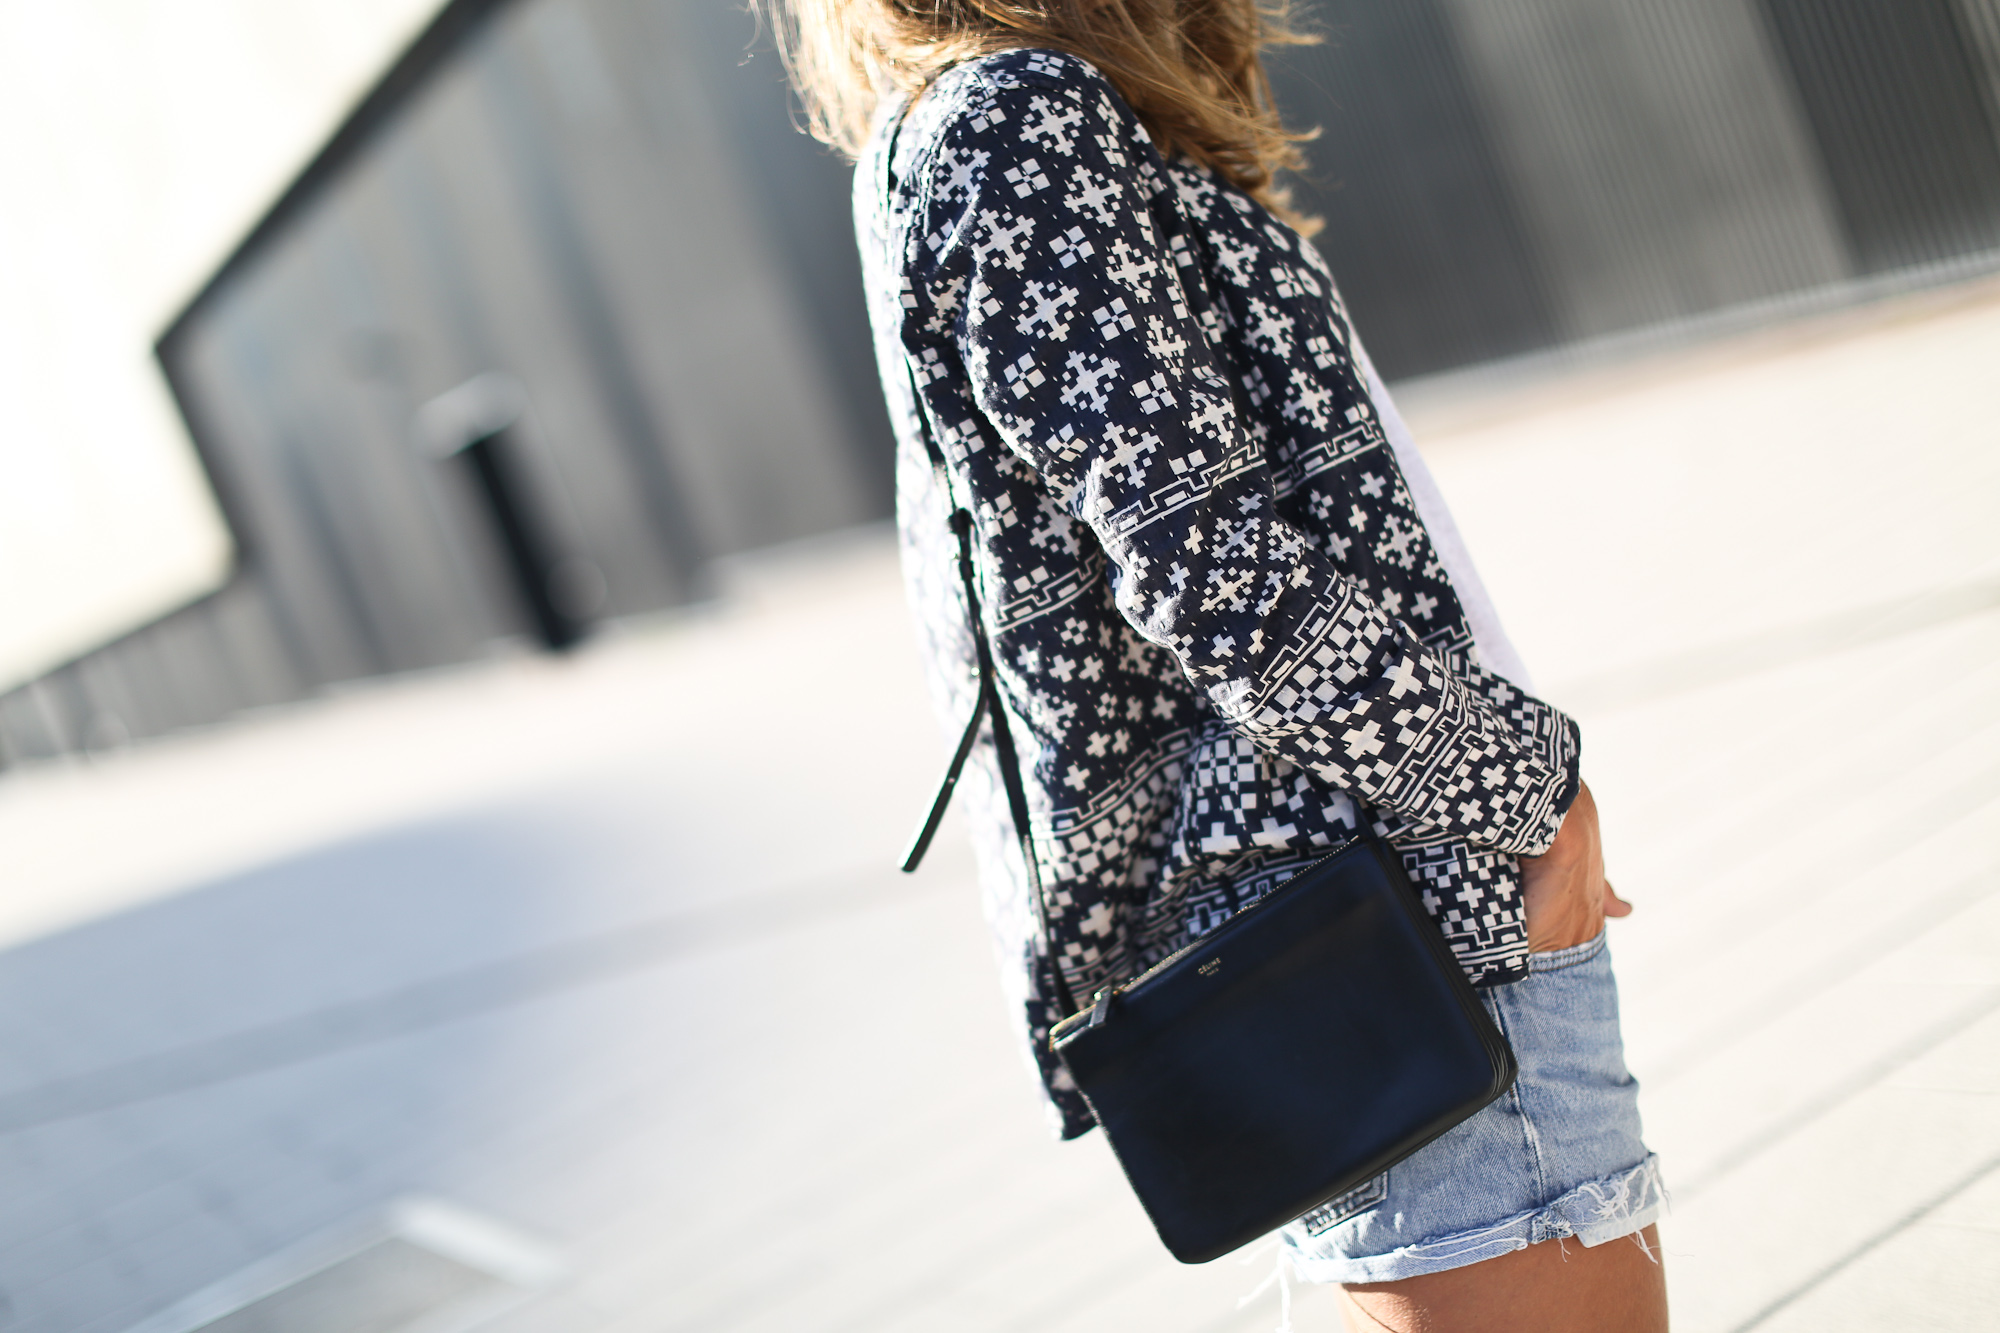 Clochet_streetstyle_mango_ethnic_kimono_levis_501_vintage_leather_espadrilles-8